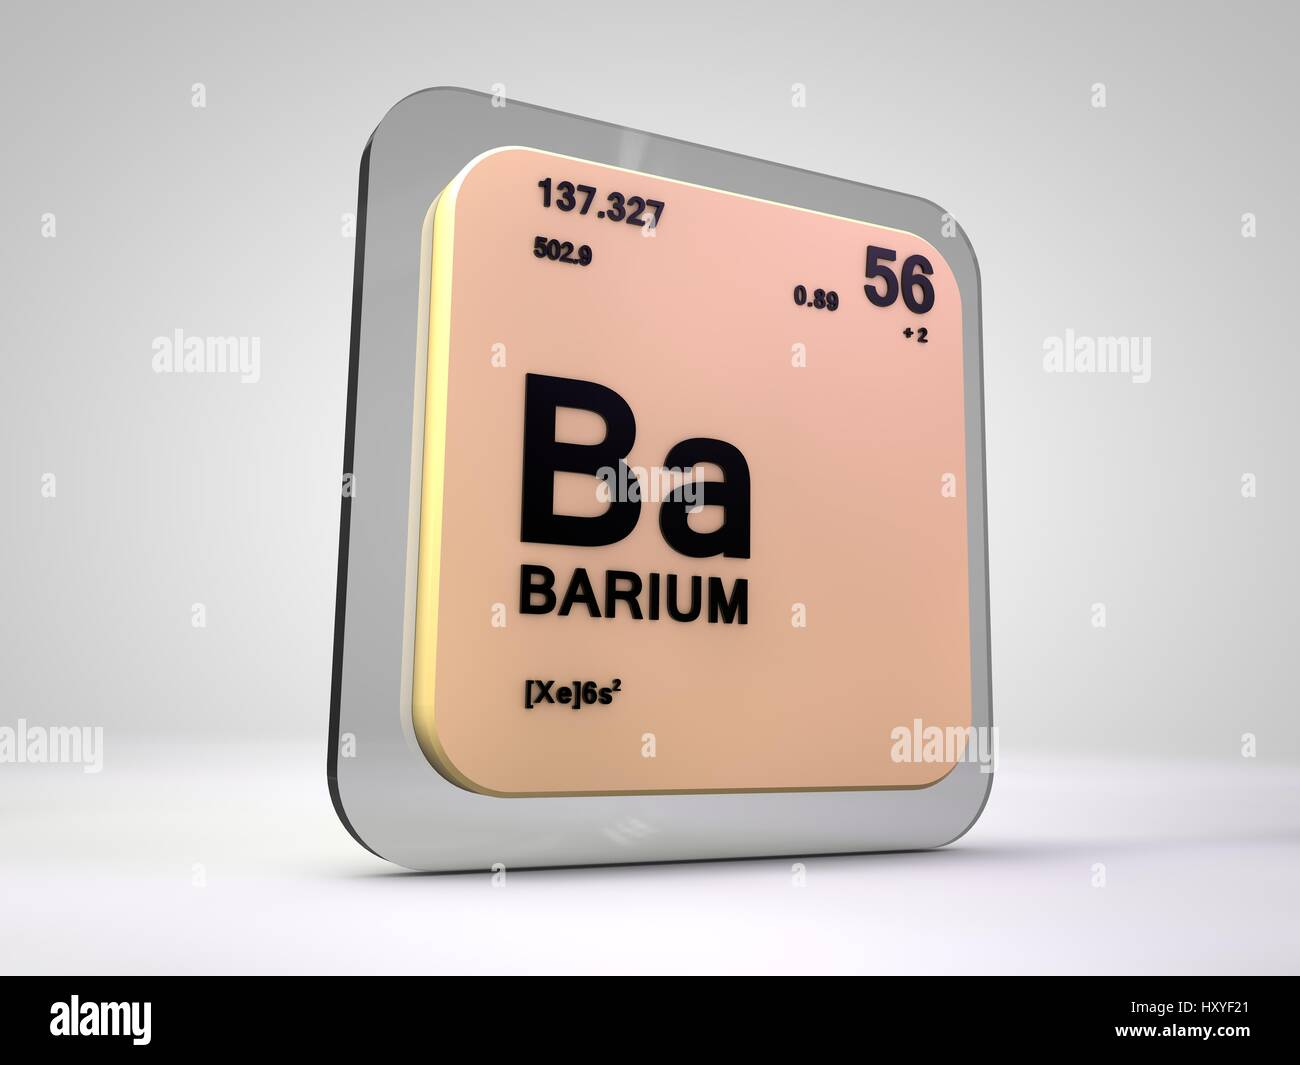 Barium ba chemical element periodic table 3d render stock barium ba chemical element periodic table 3d render biocorpaavc Images